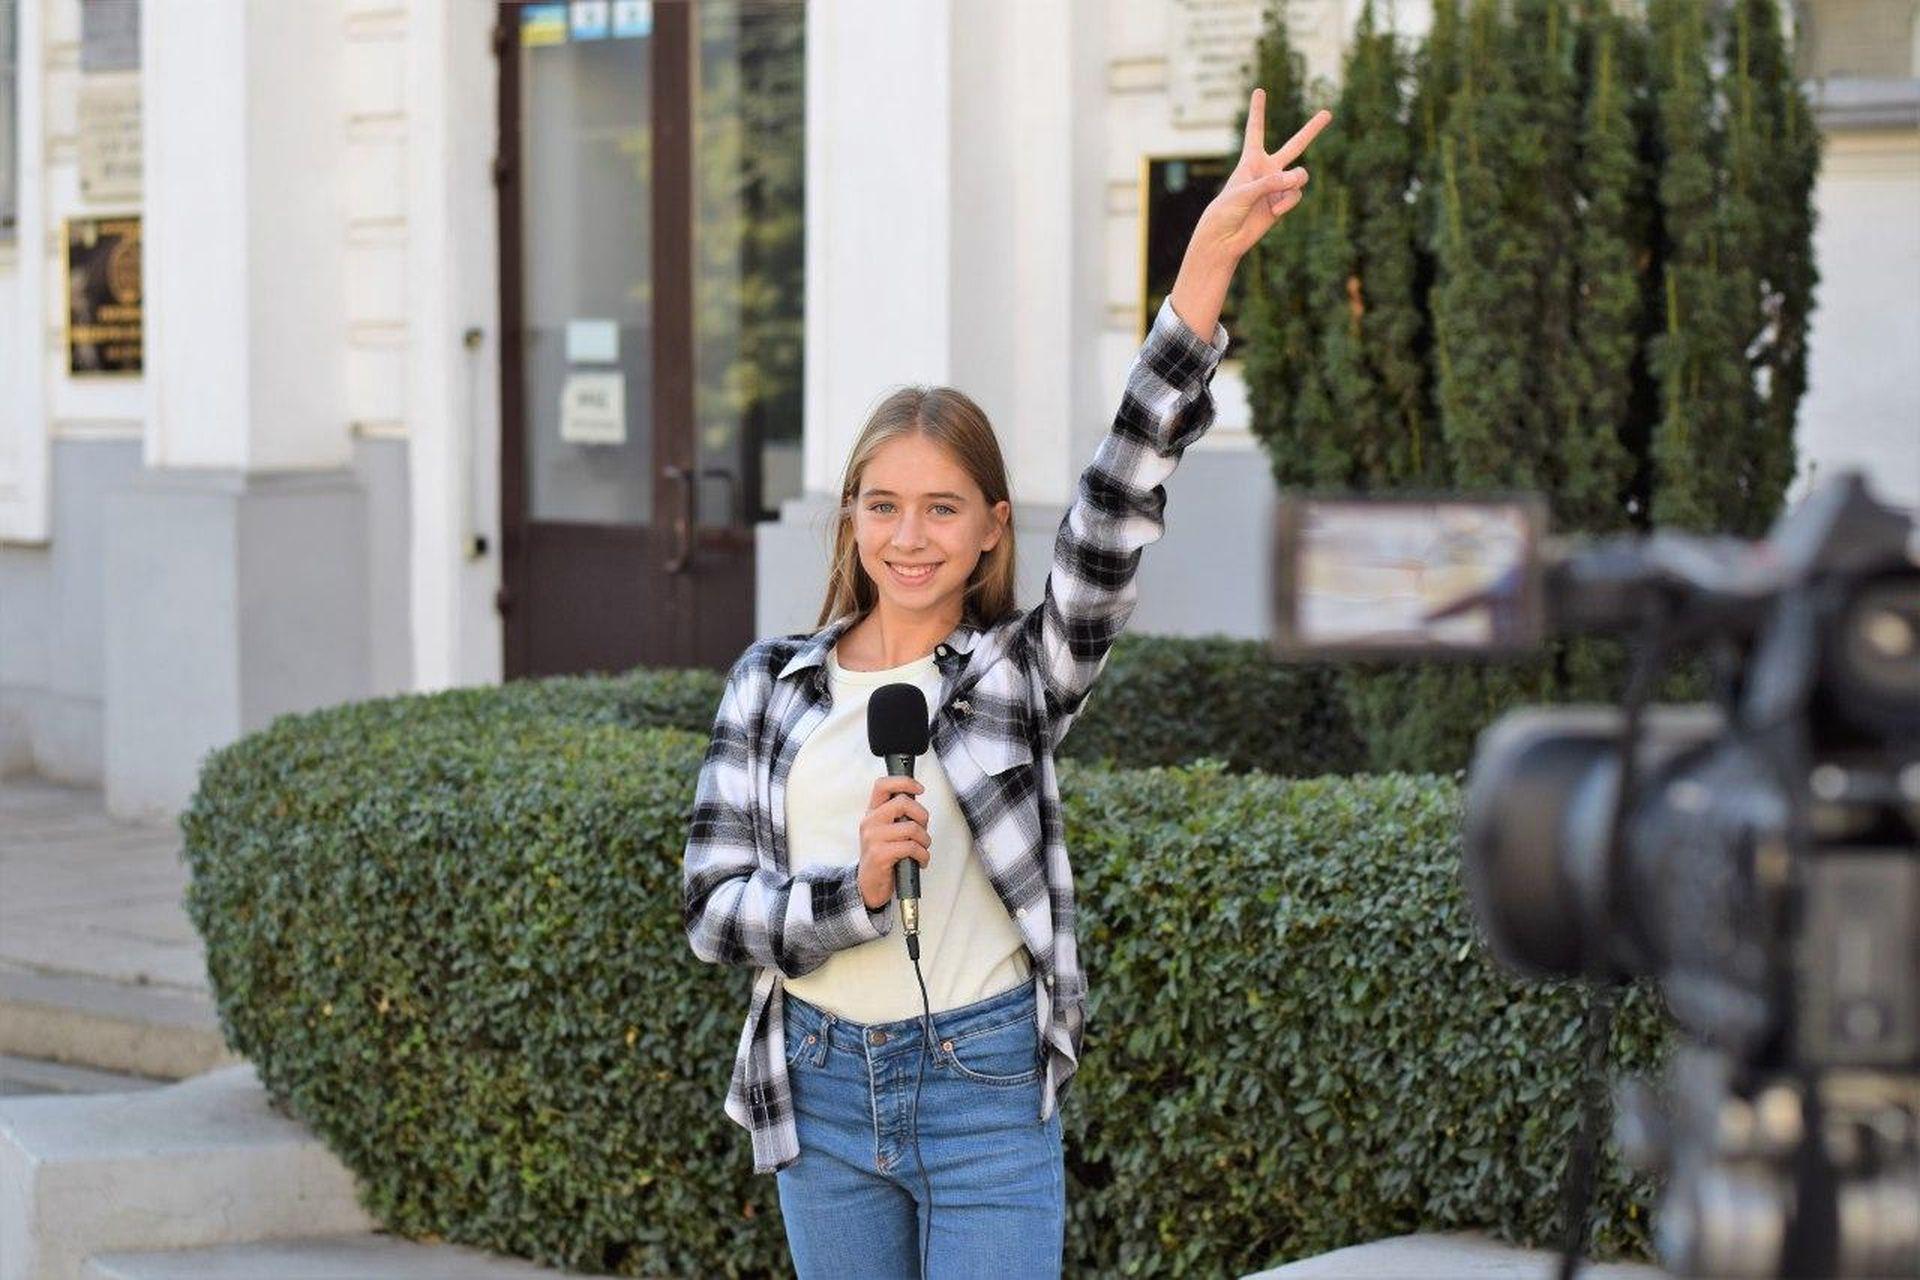 Школа медиа-ребенка - Академия журналистики и коммуникаций